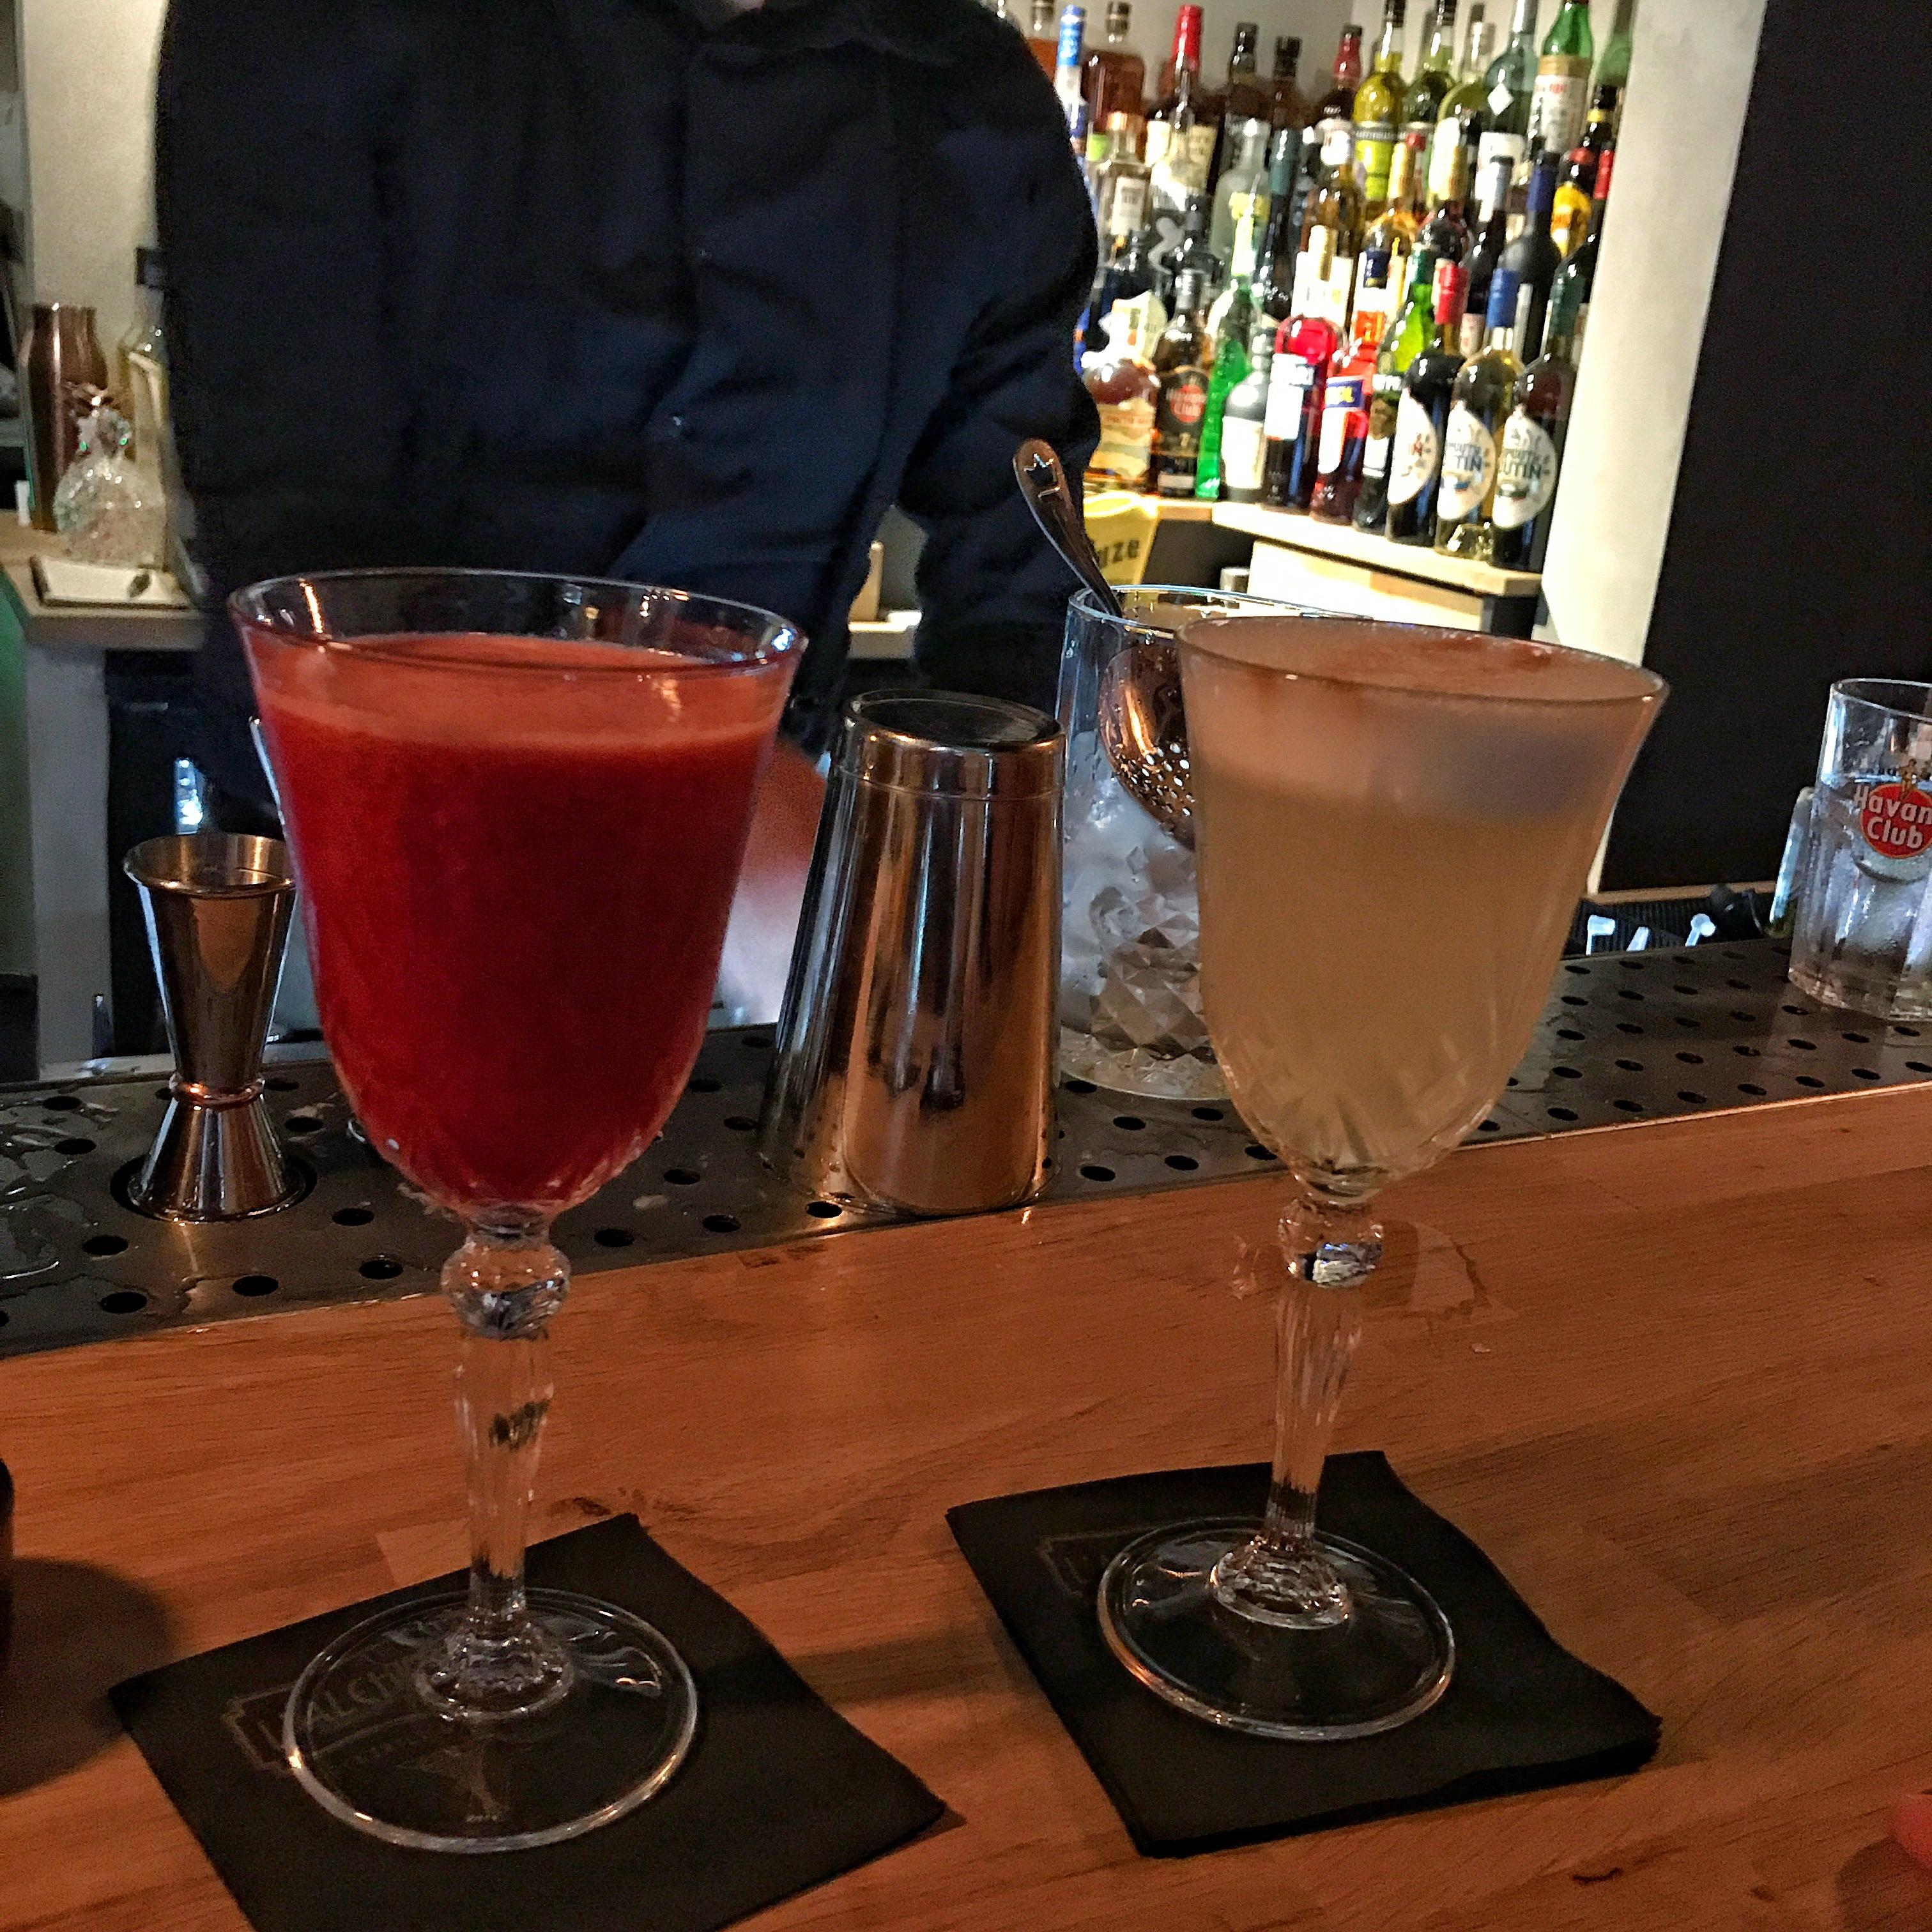 L'Alchimiste : Raspberry Desire et Pisco Sour